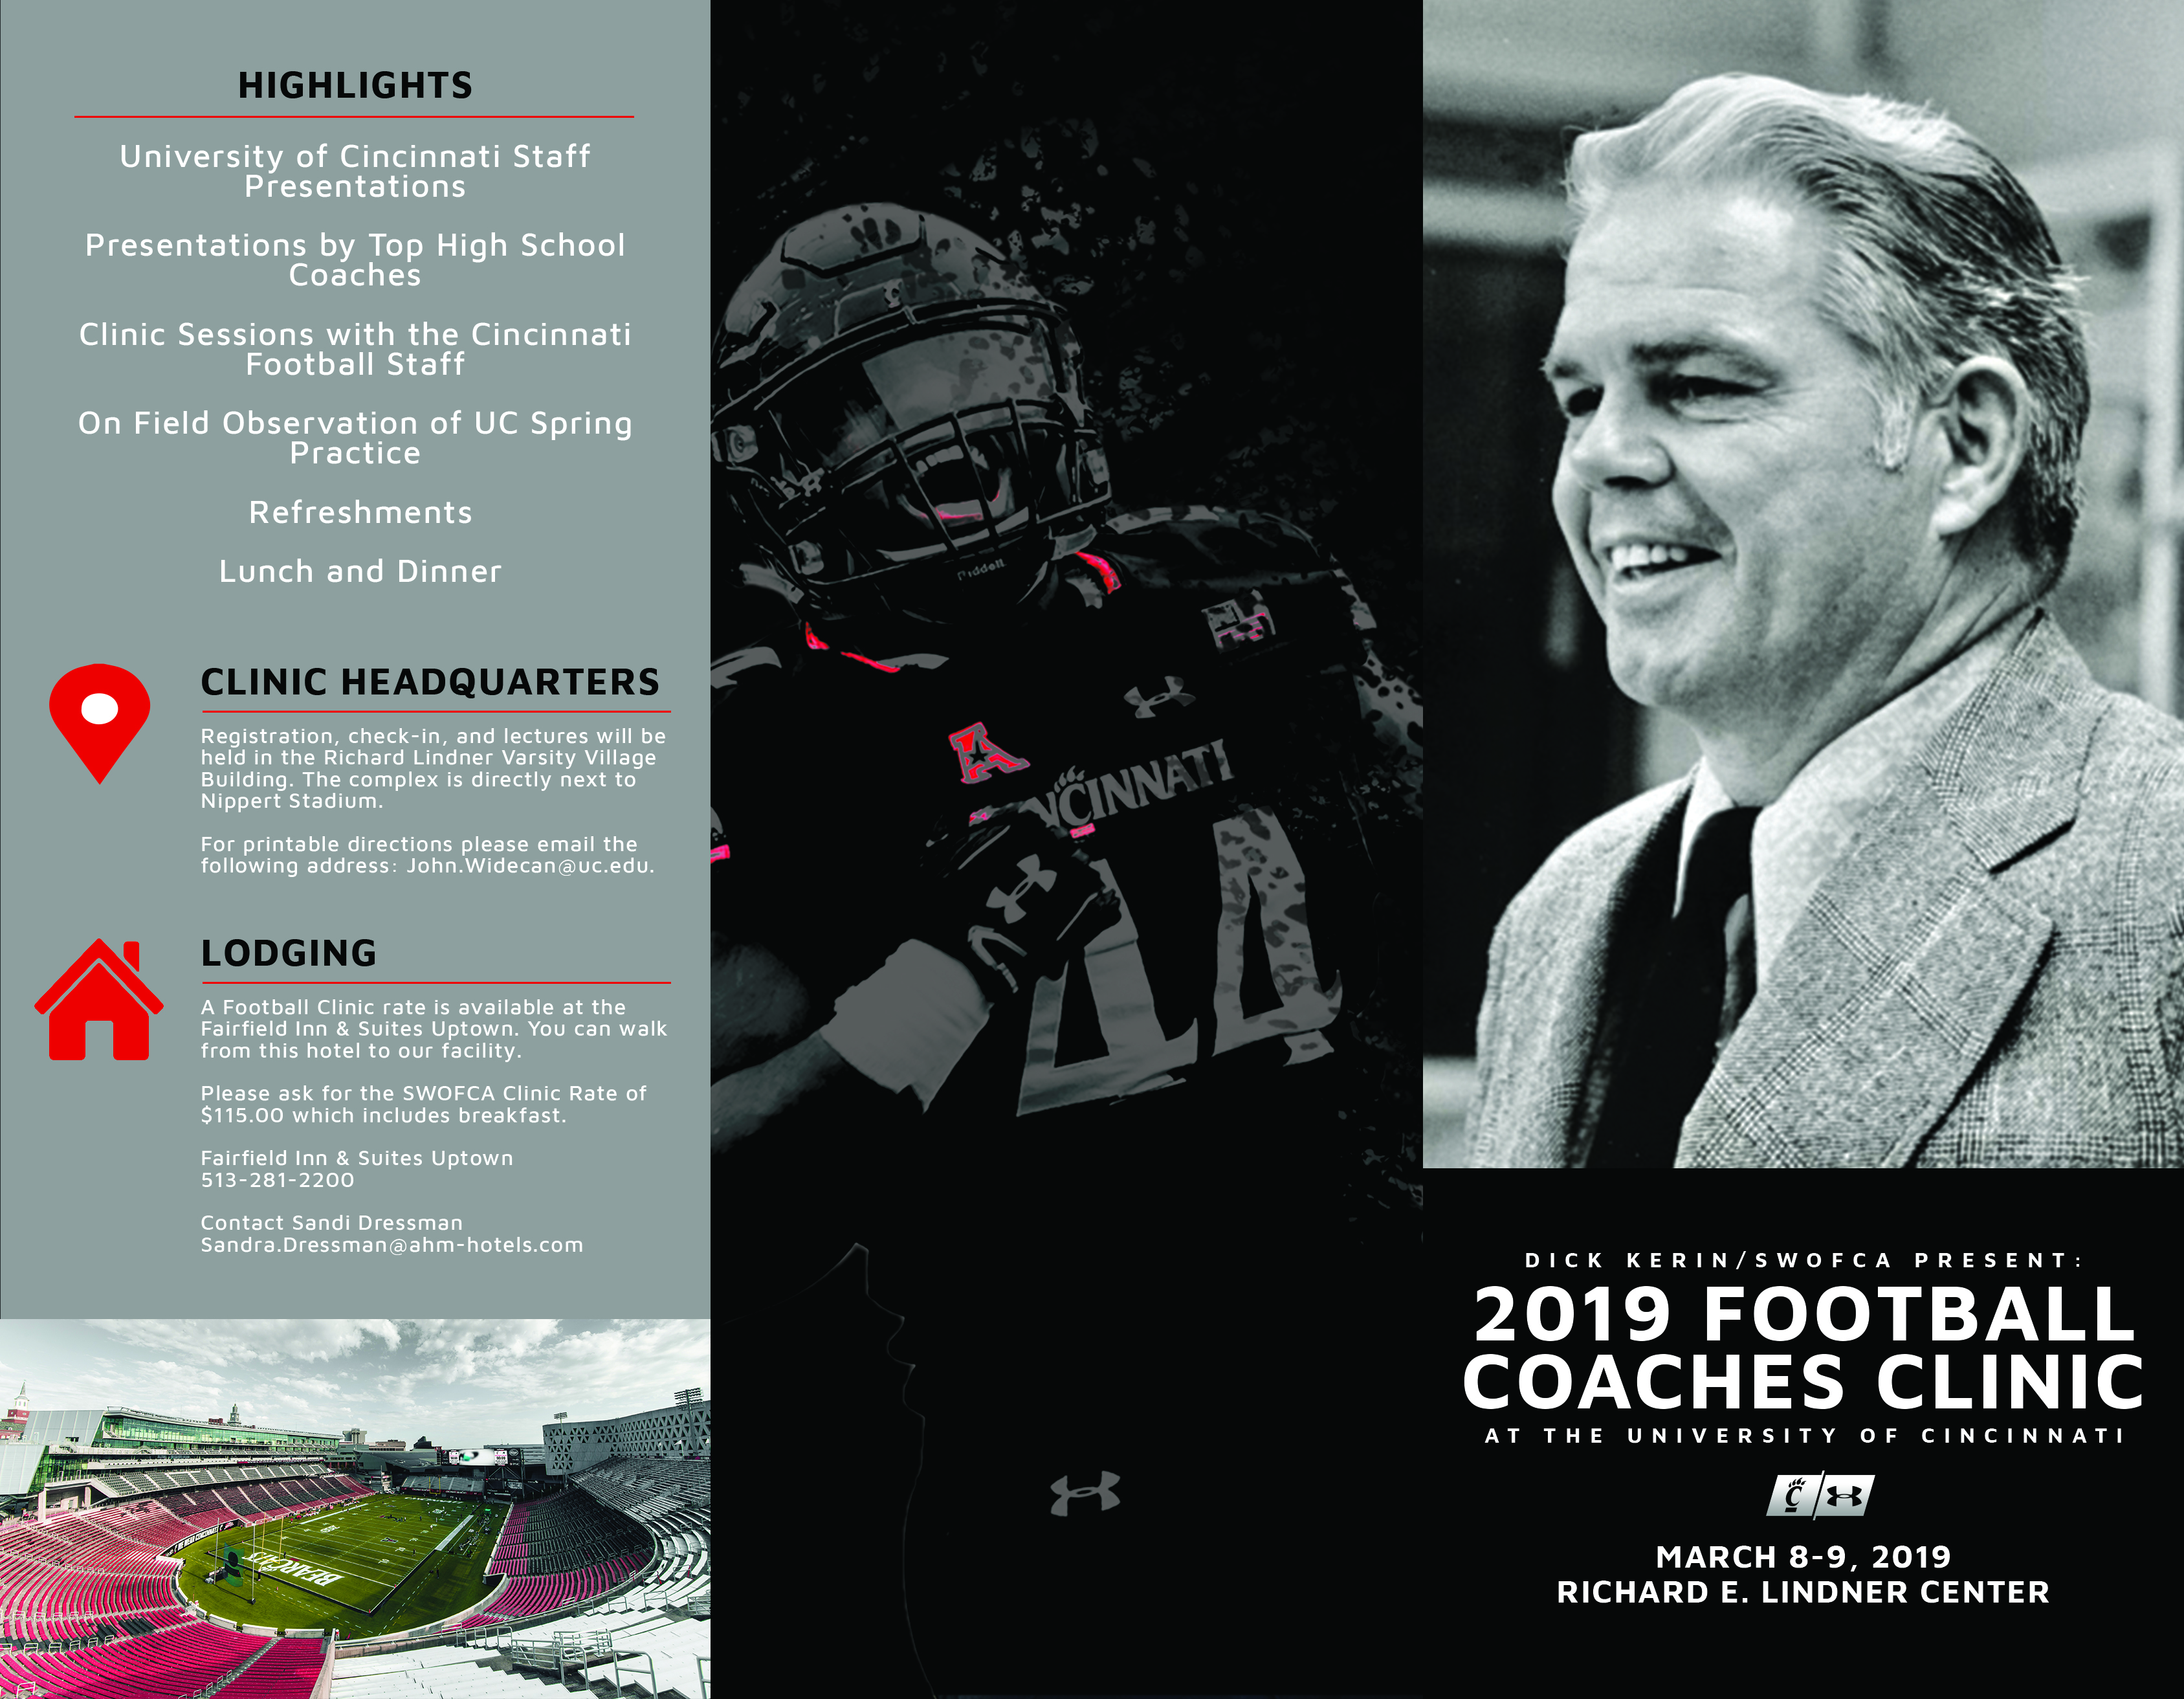 Southwest Ohio Football Coaches Association (SWOFCA